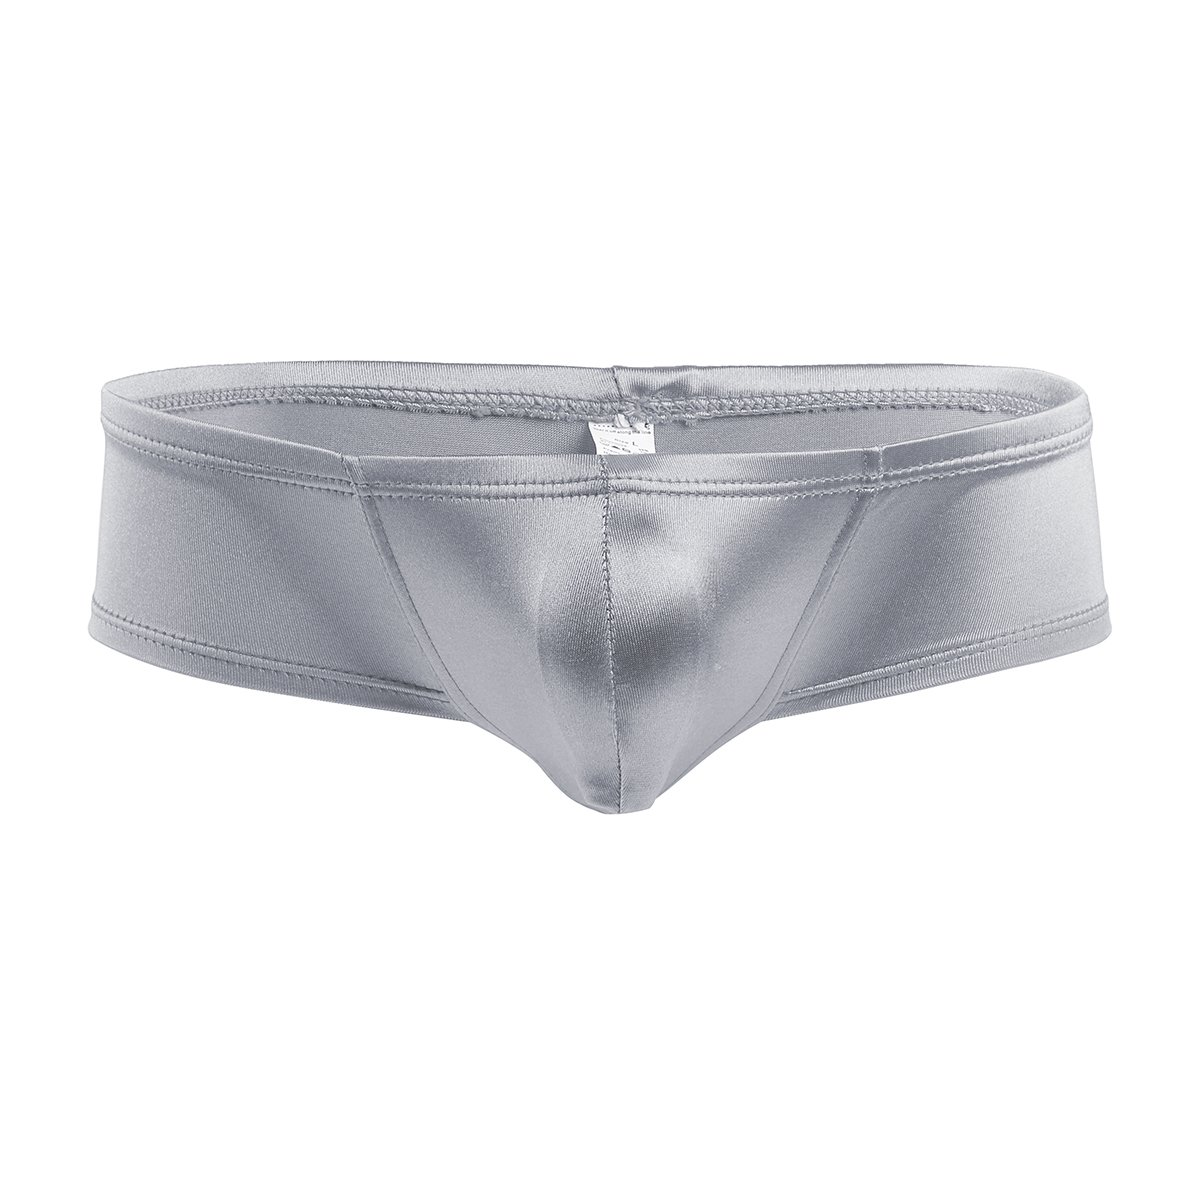 666841f1fa iEFiEL Mens Shiny Cap Cover Bulge Pouch Low Rise Mini Bikini Briefs  Lingerie Underwear Silver XXL